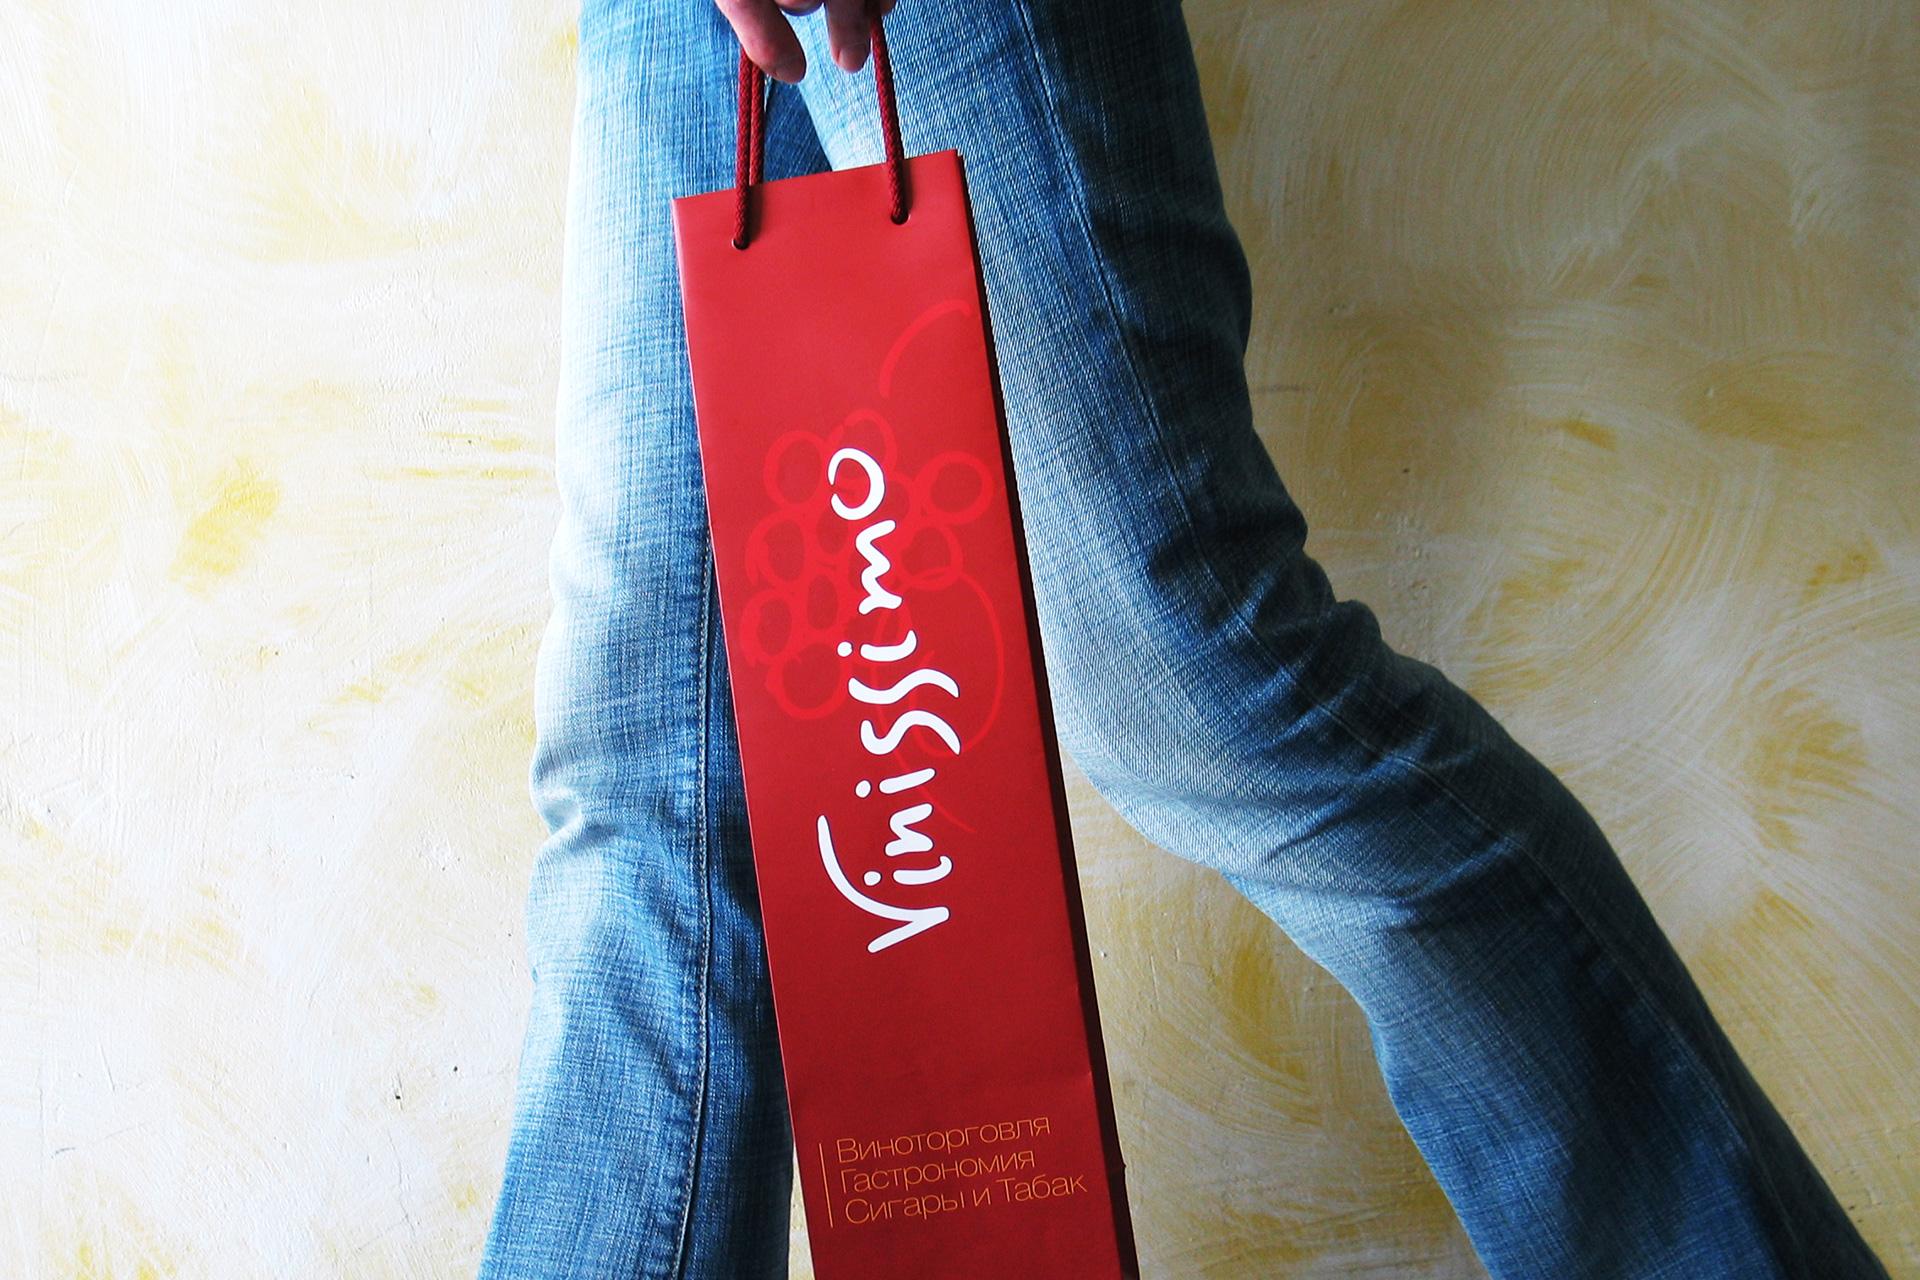 Asgard Branding, corporate identity, branding, wine, logo, design, package design